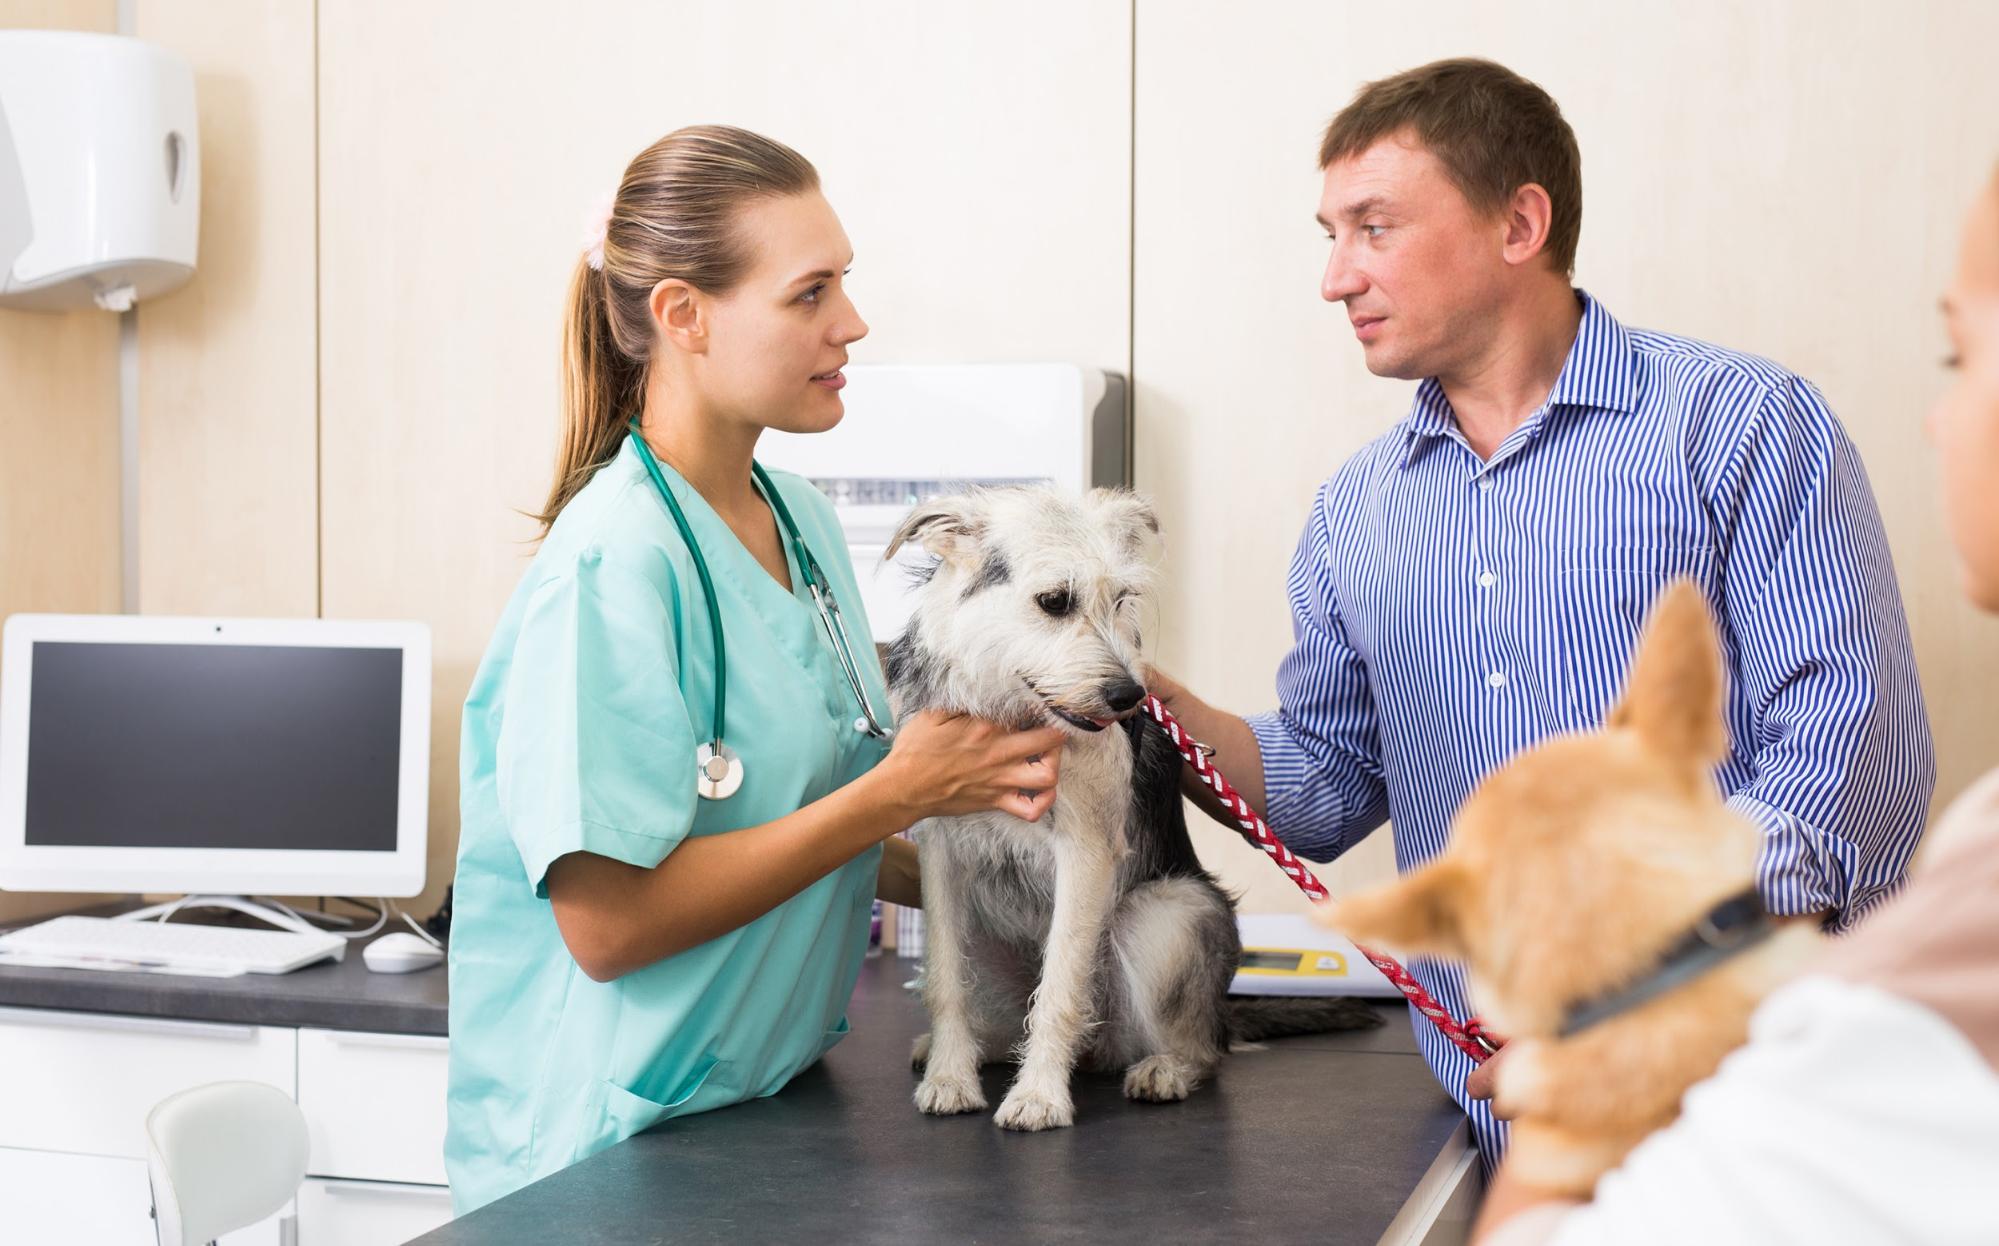 A pet parent getting treatment at the vet